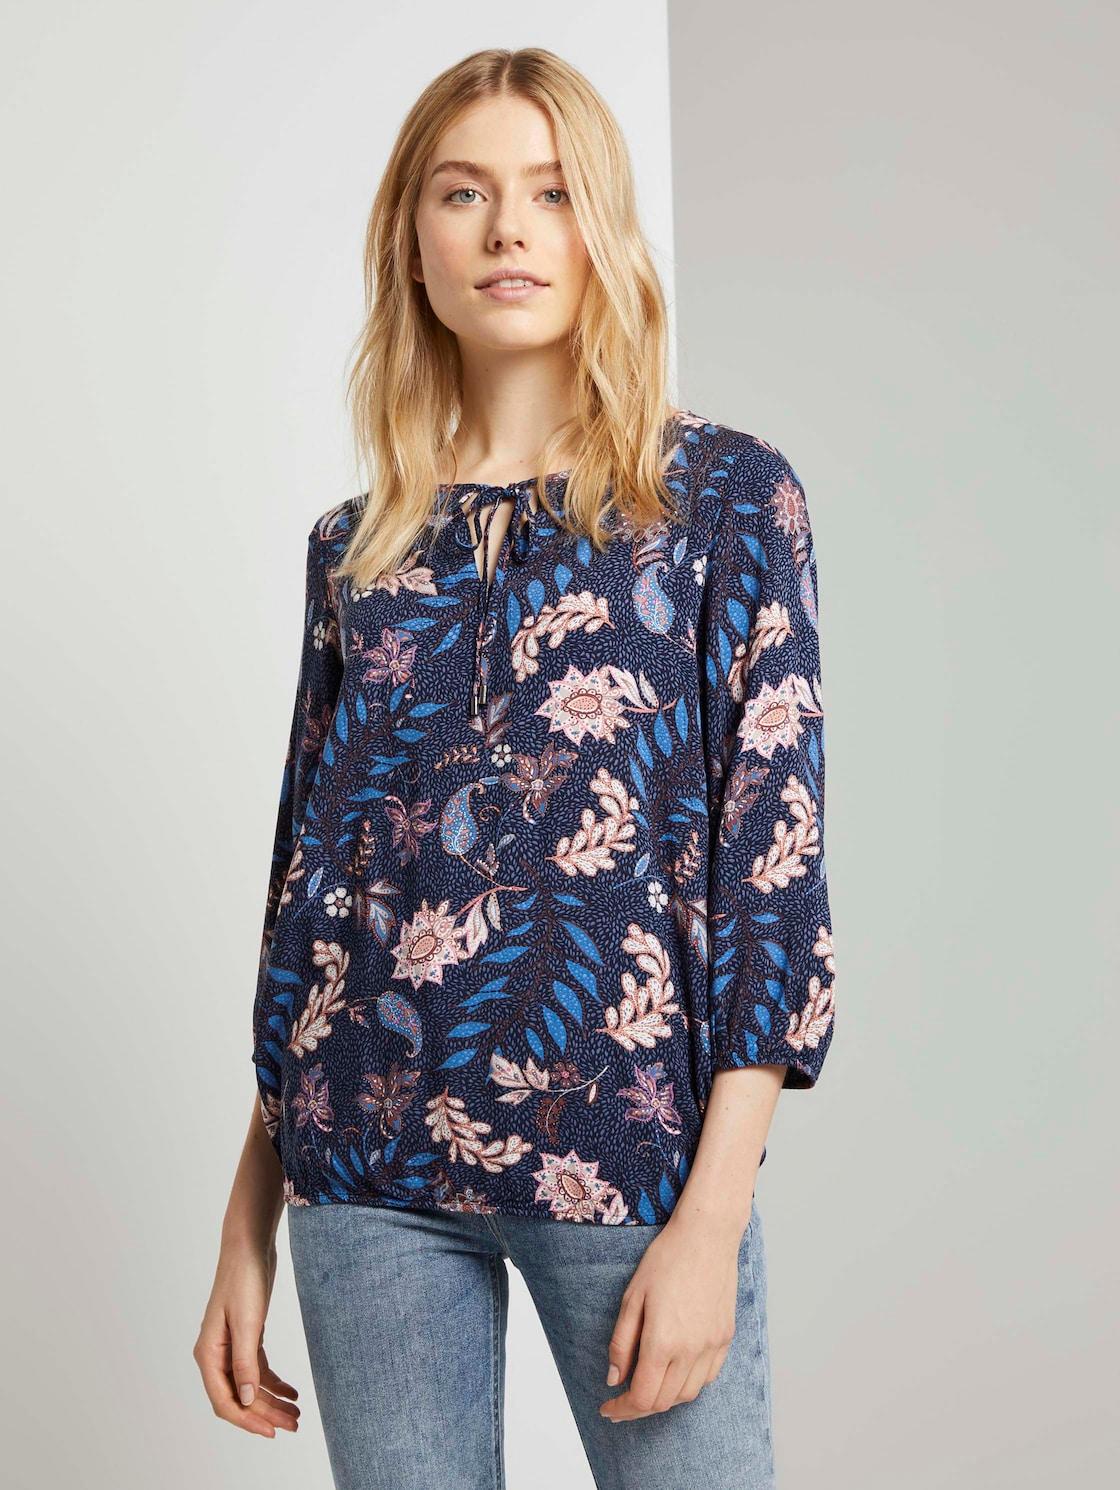 Tom Tailor Bloemenprint Blouse, navy floral design